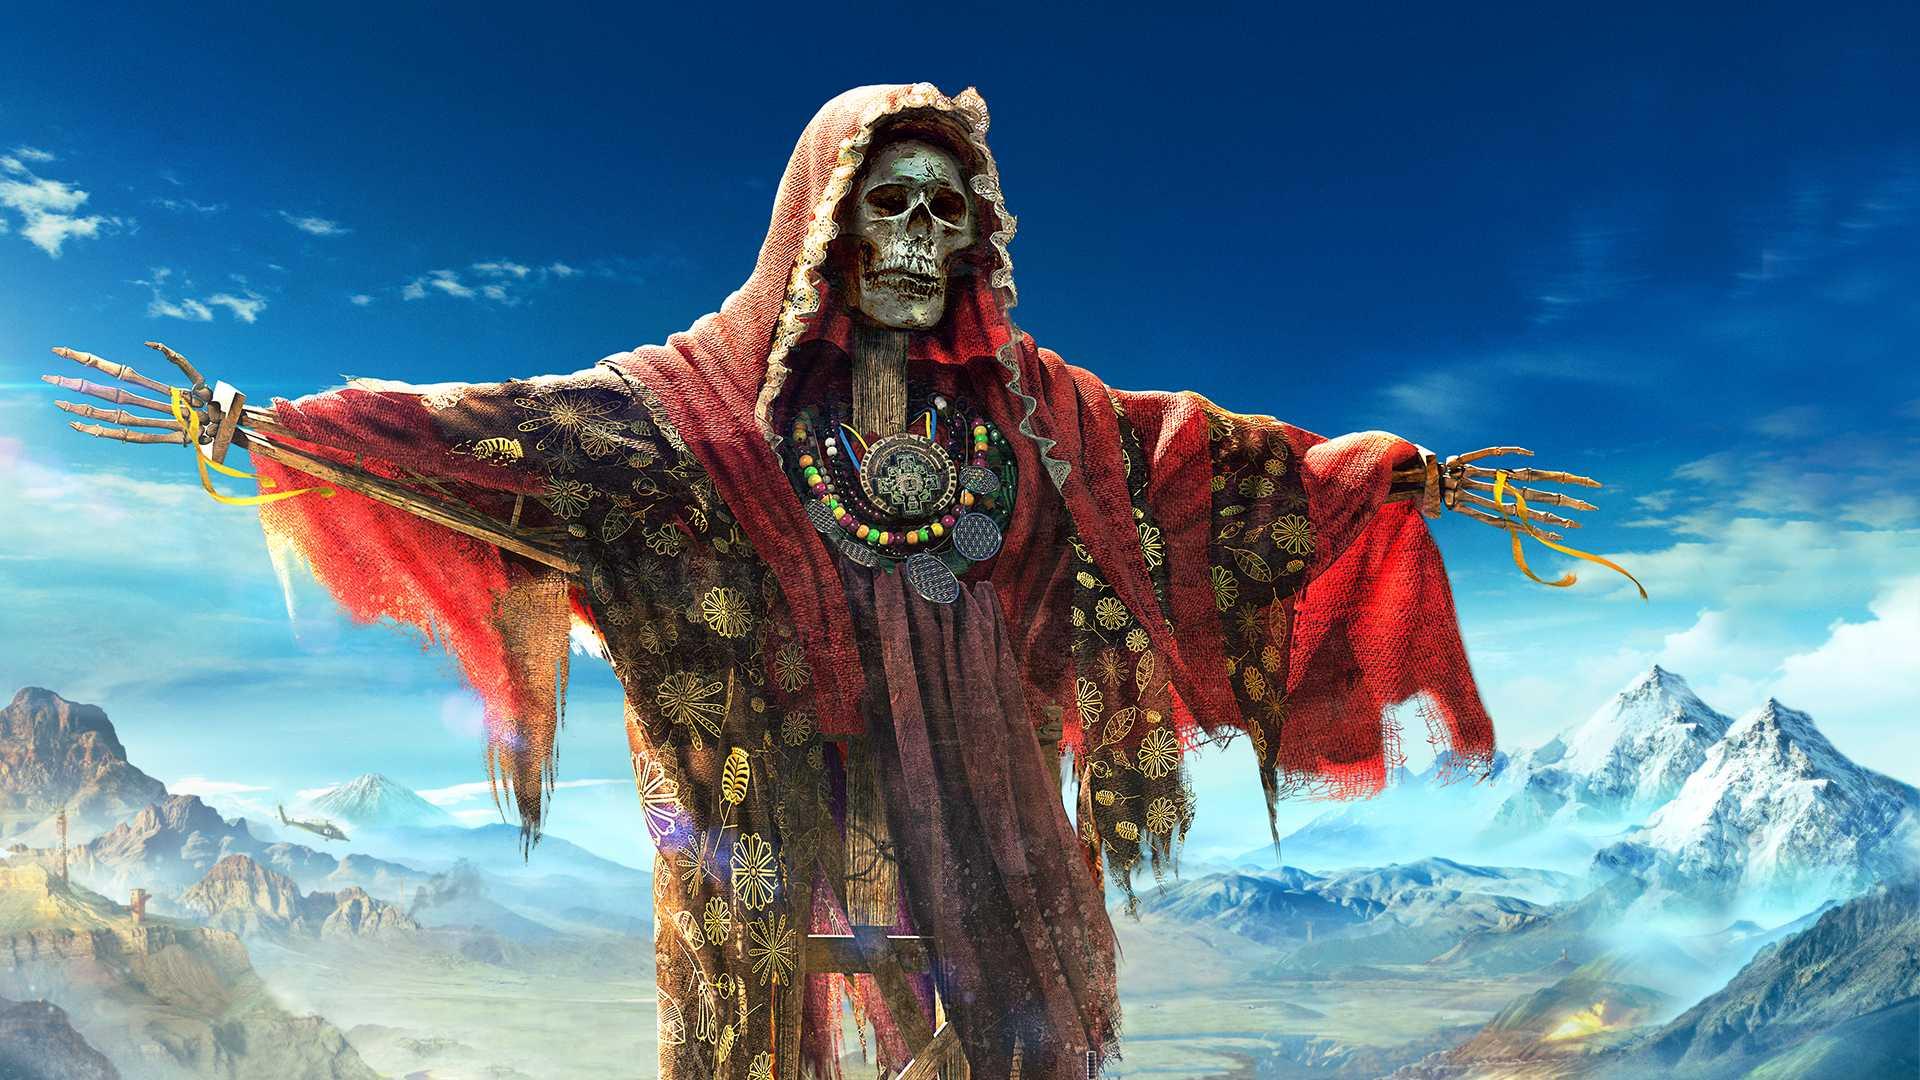 Tom Clancys Ghost Recon Wildlands 2017 Hd Games 4k: Buy Tom Clancy's Ghost Recon® Wildlands